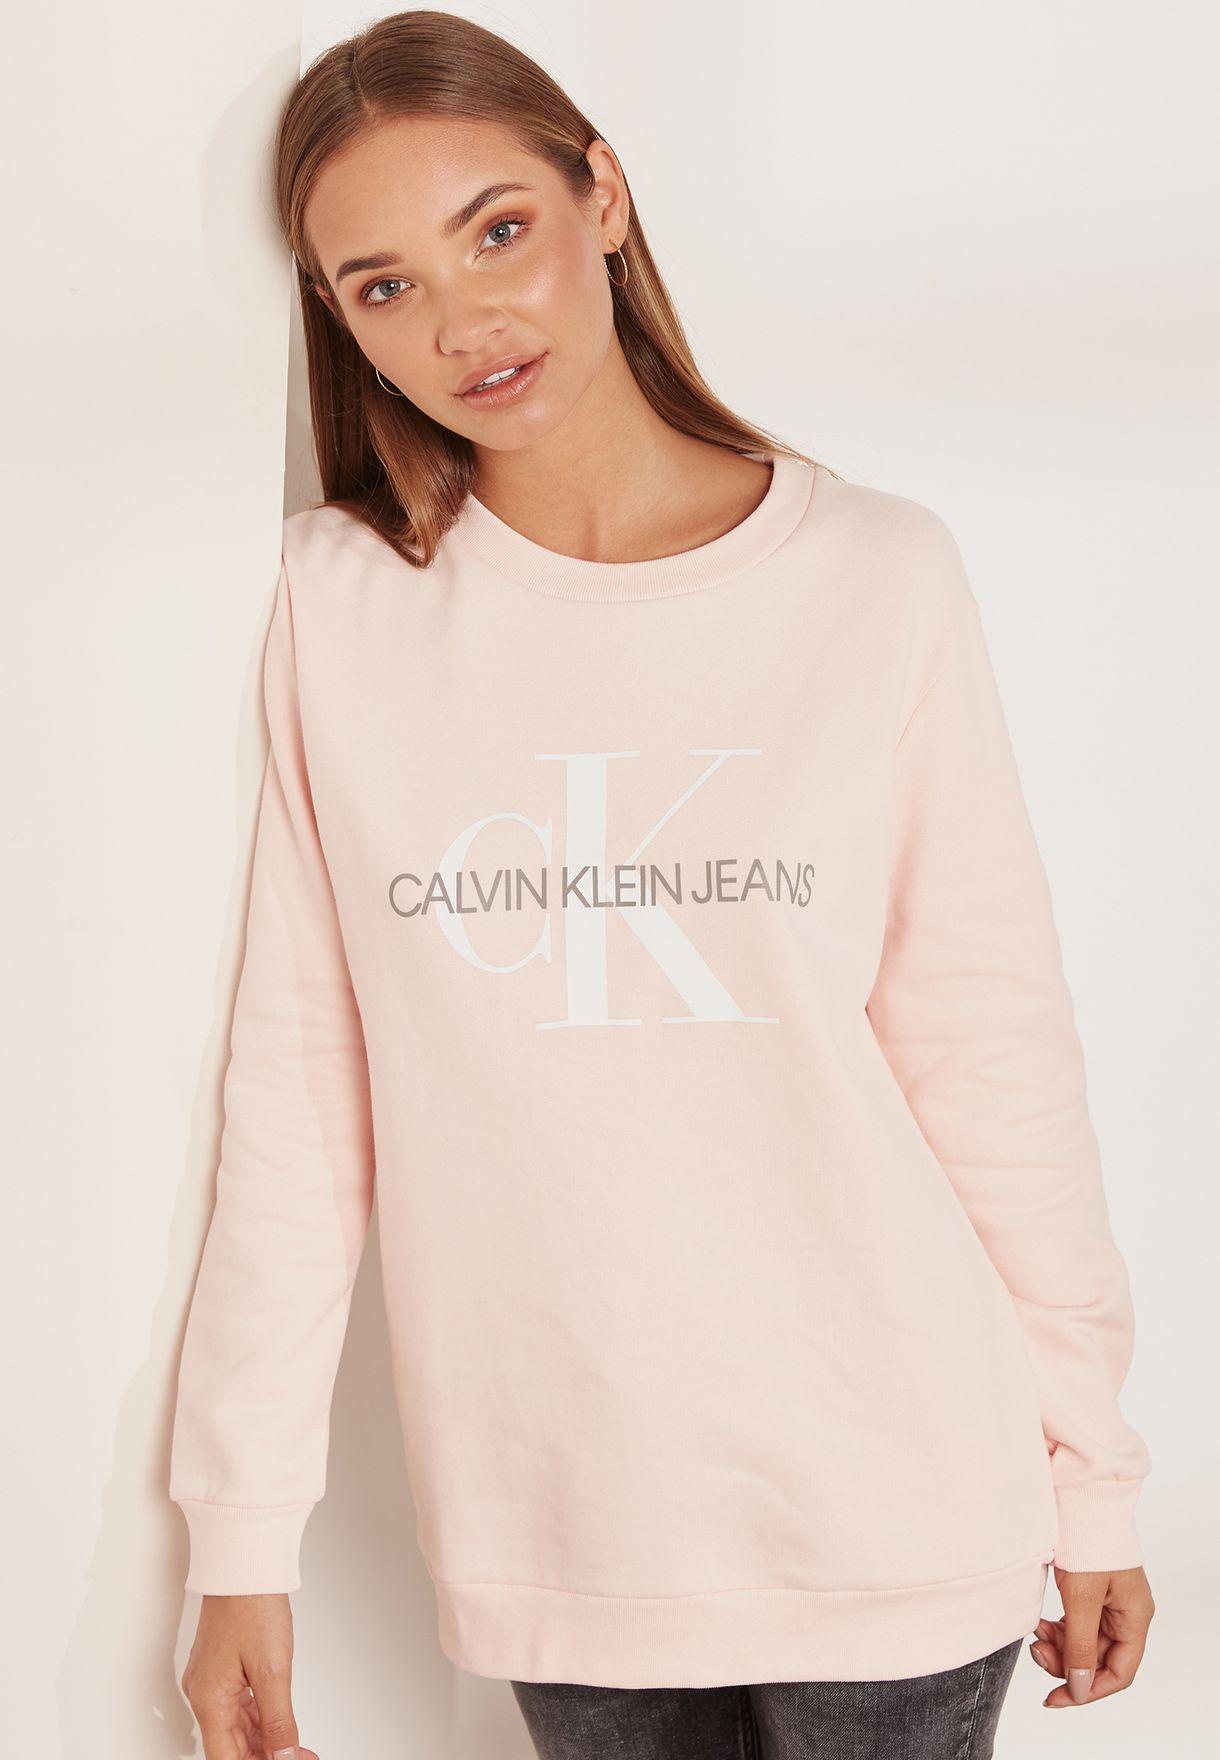 a5f7183121c Shop Calvin Klein Jeans pink Logo Sweatshirt J20J207830 for Women in UAE -  CA294AT14UWV